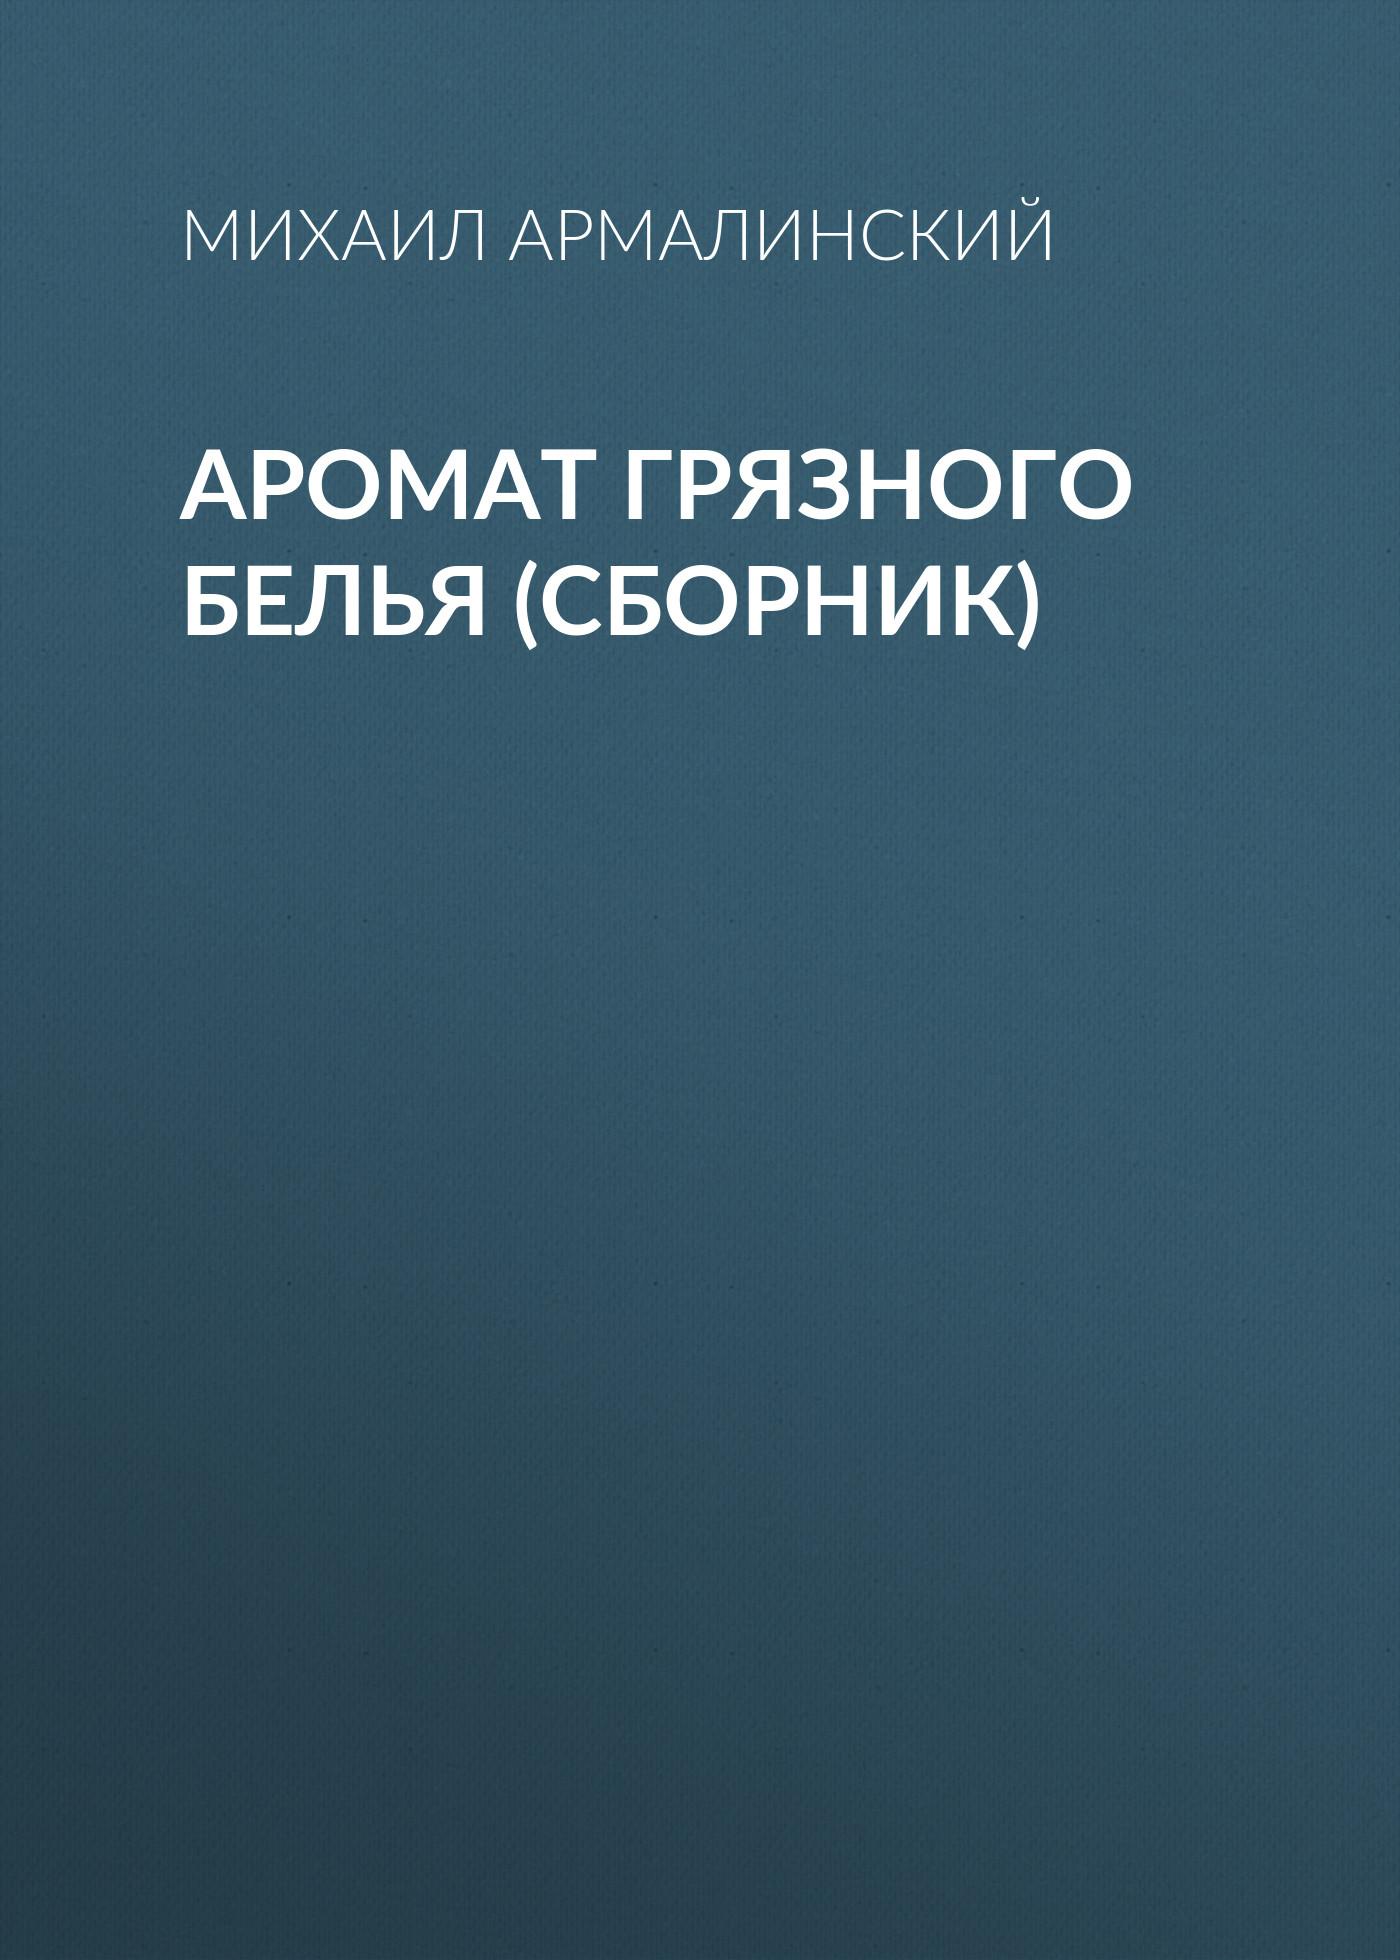 Михаил Армалинский Аромат грязного белья (сборник)